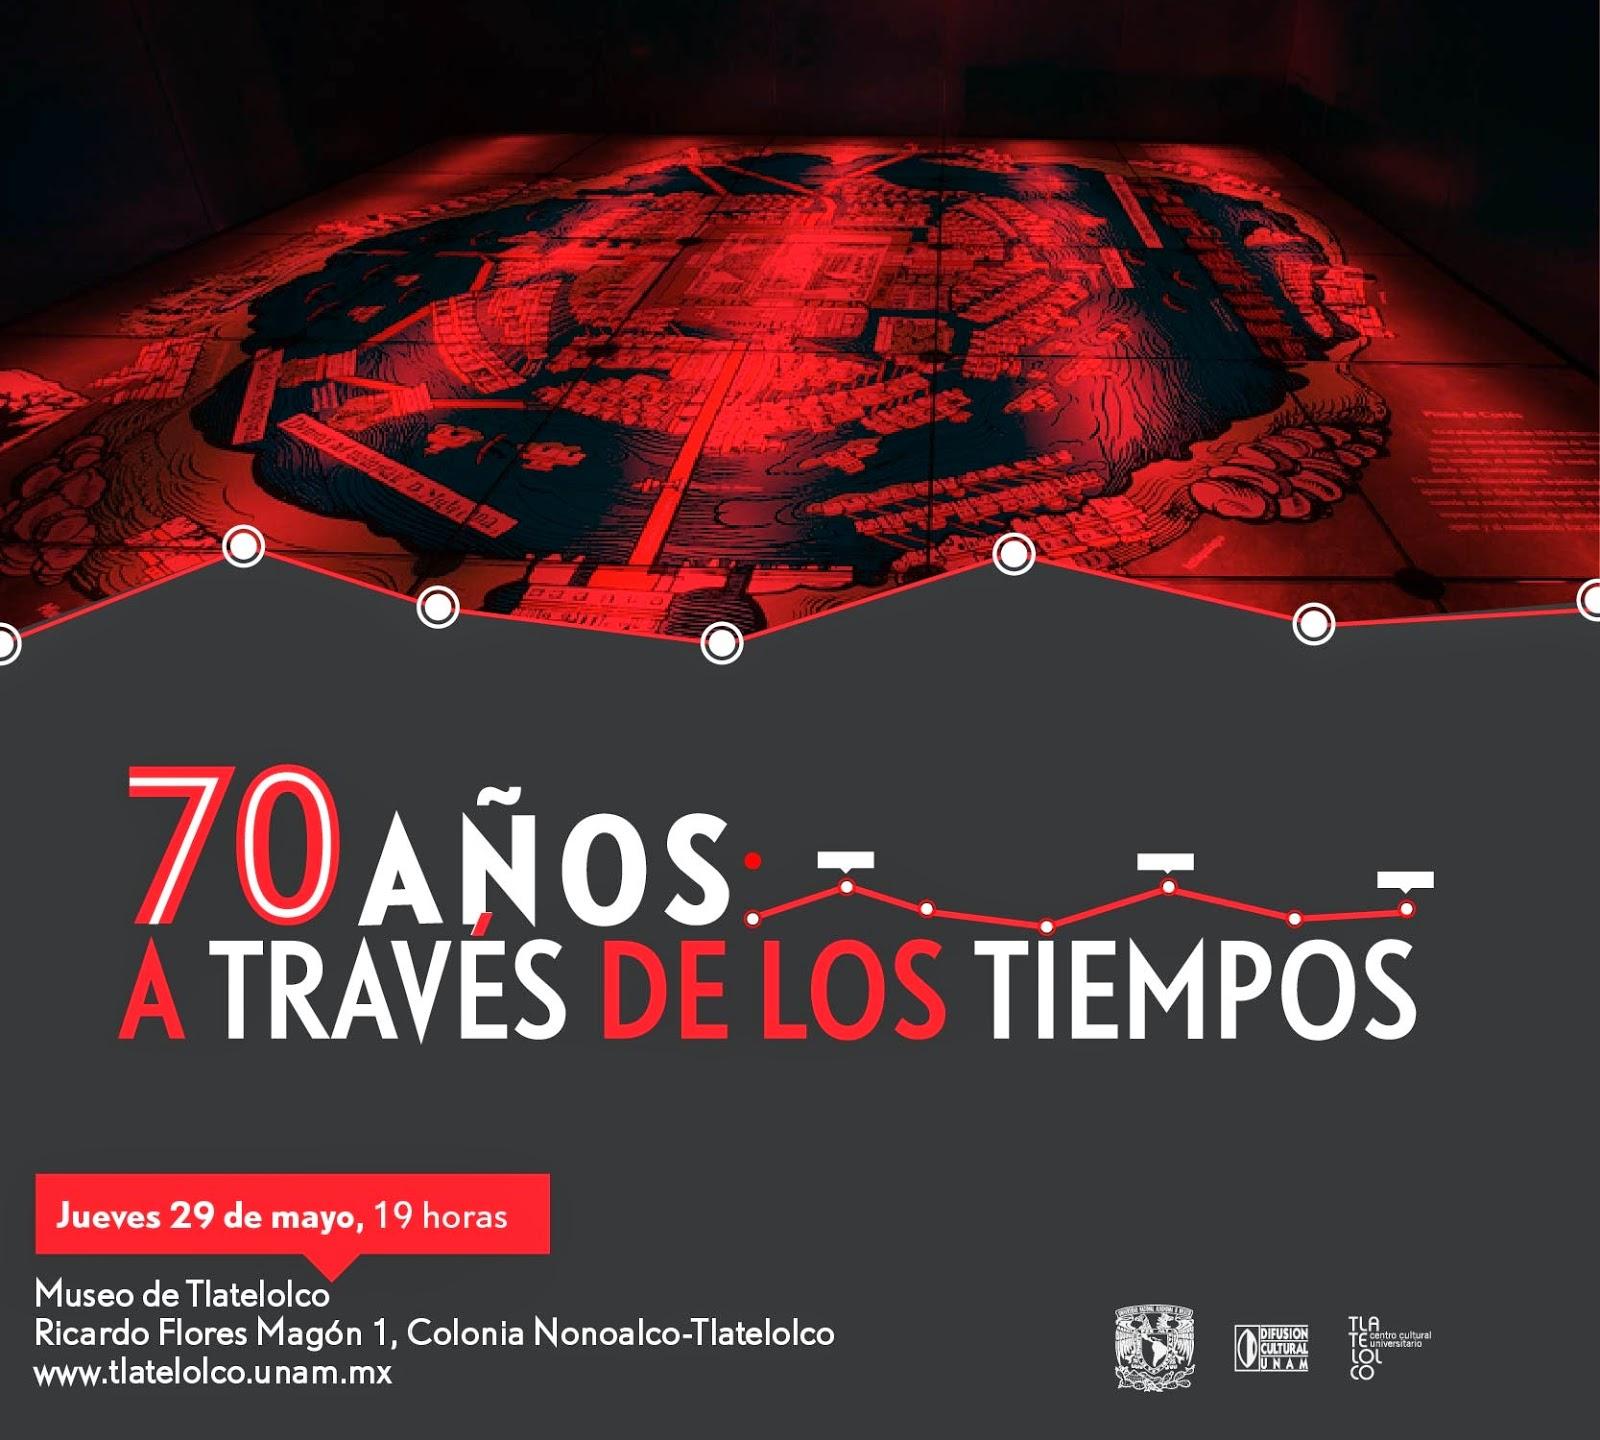 Exposición fotográfica sobre la historia de Tlatelolco